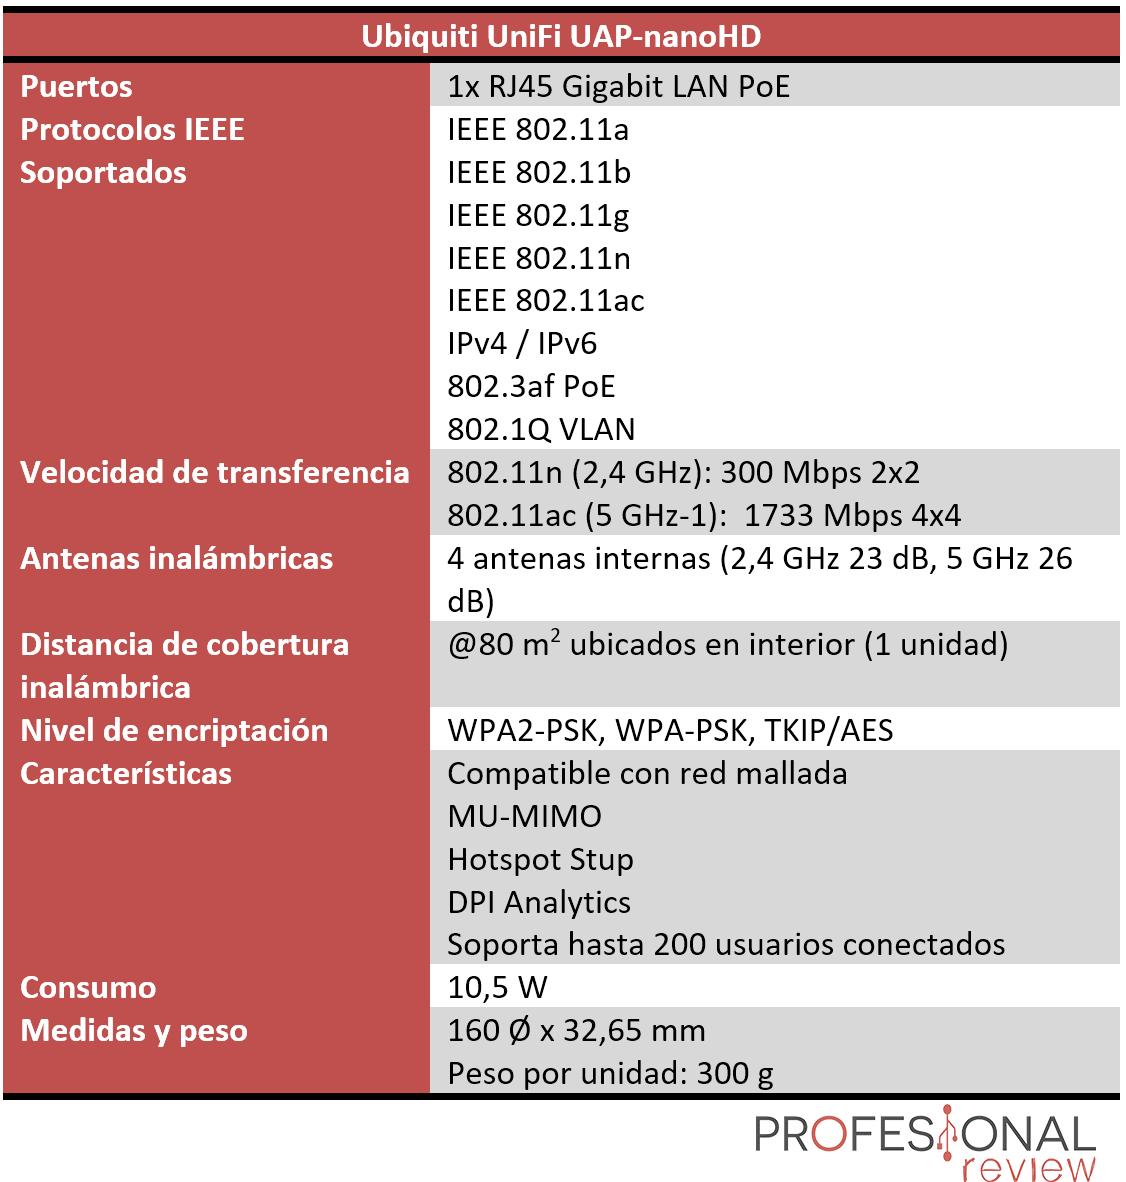 Ubiquiti UniFi UAP-nanoHD Características